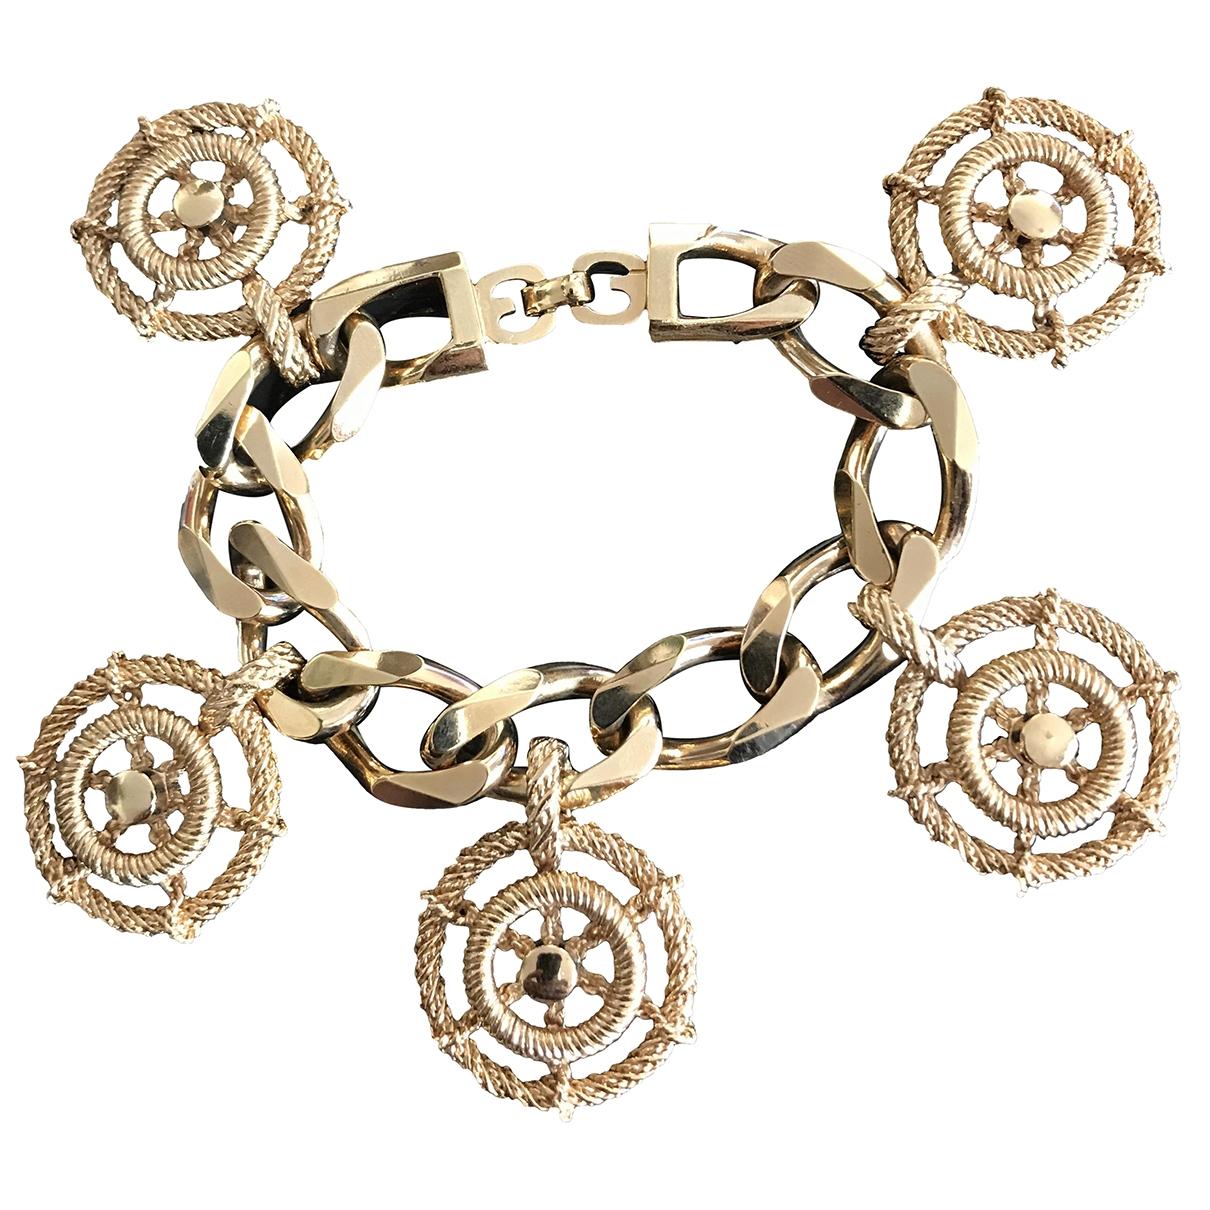 Grosse - Bracelet   pour femme en metal - dore